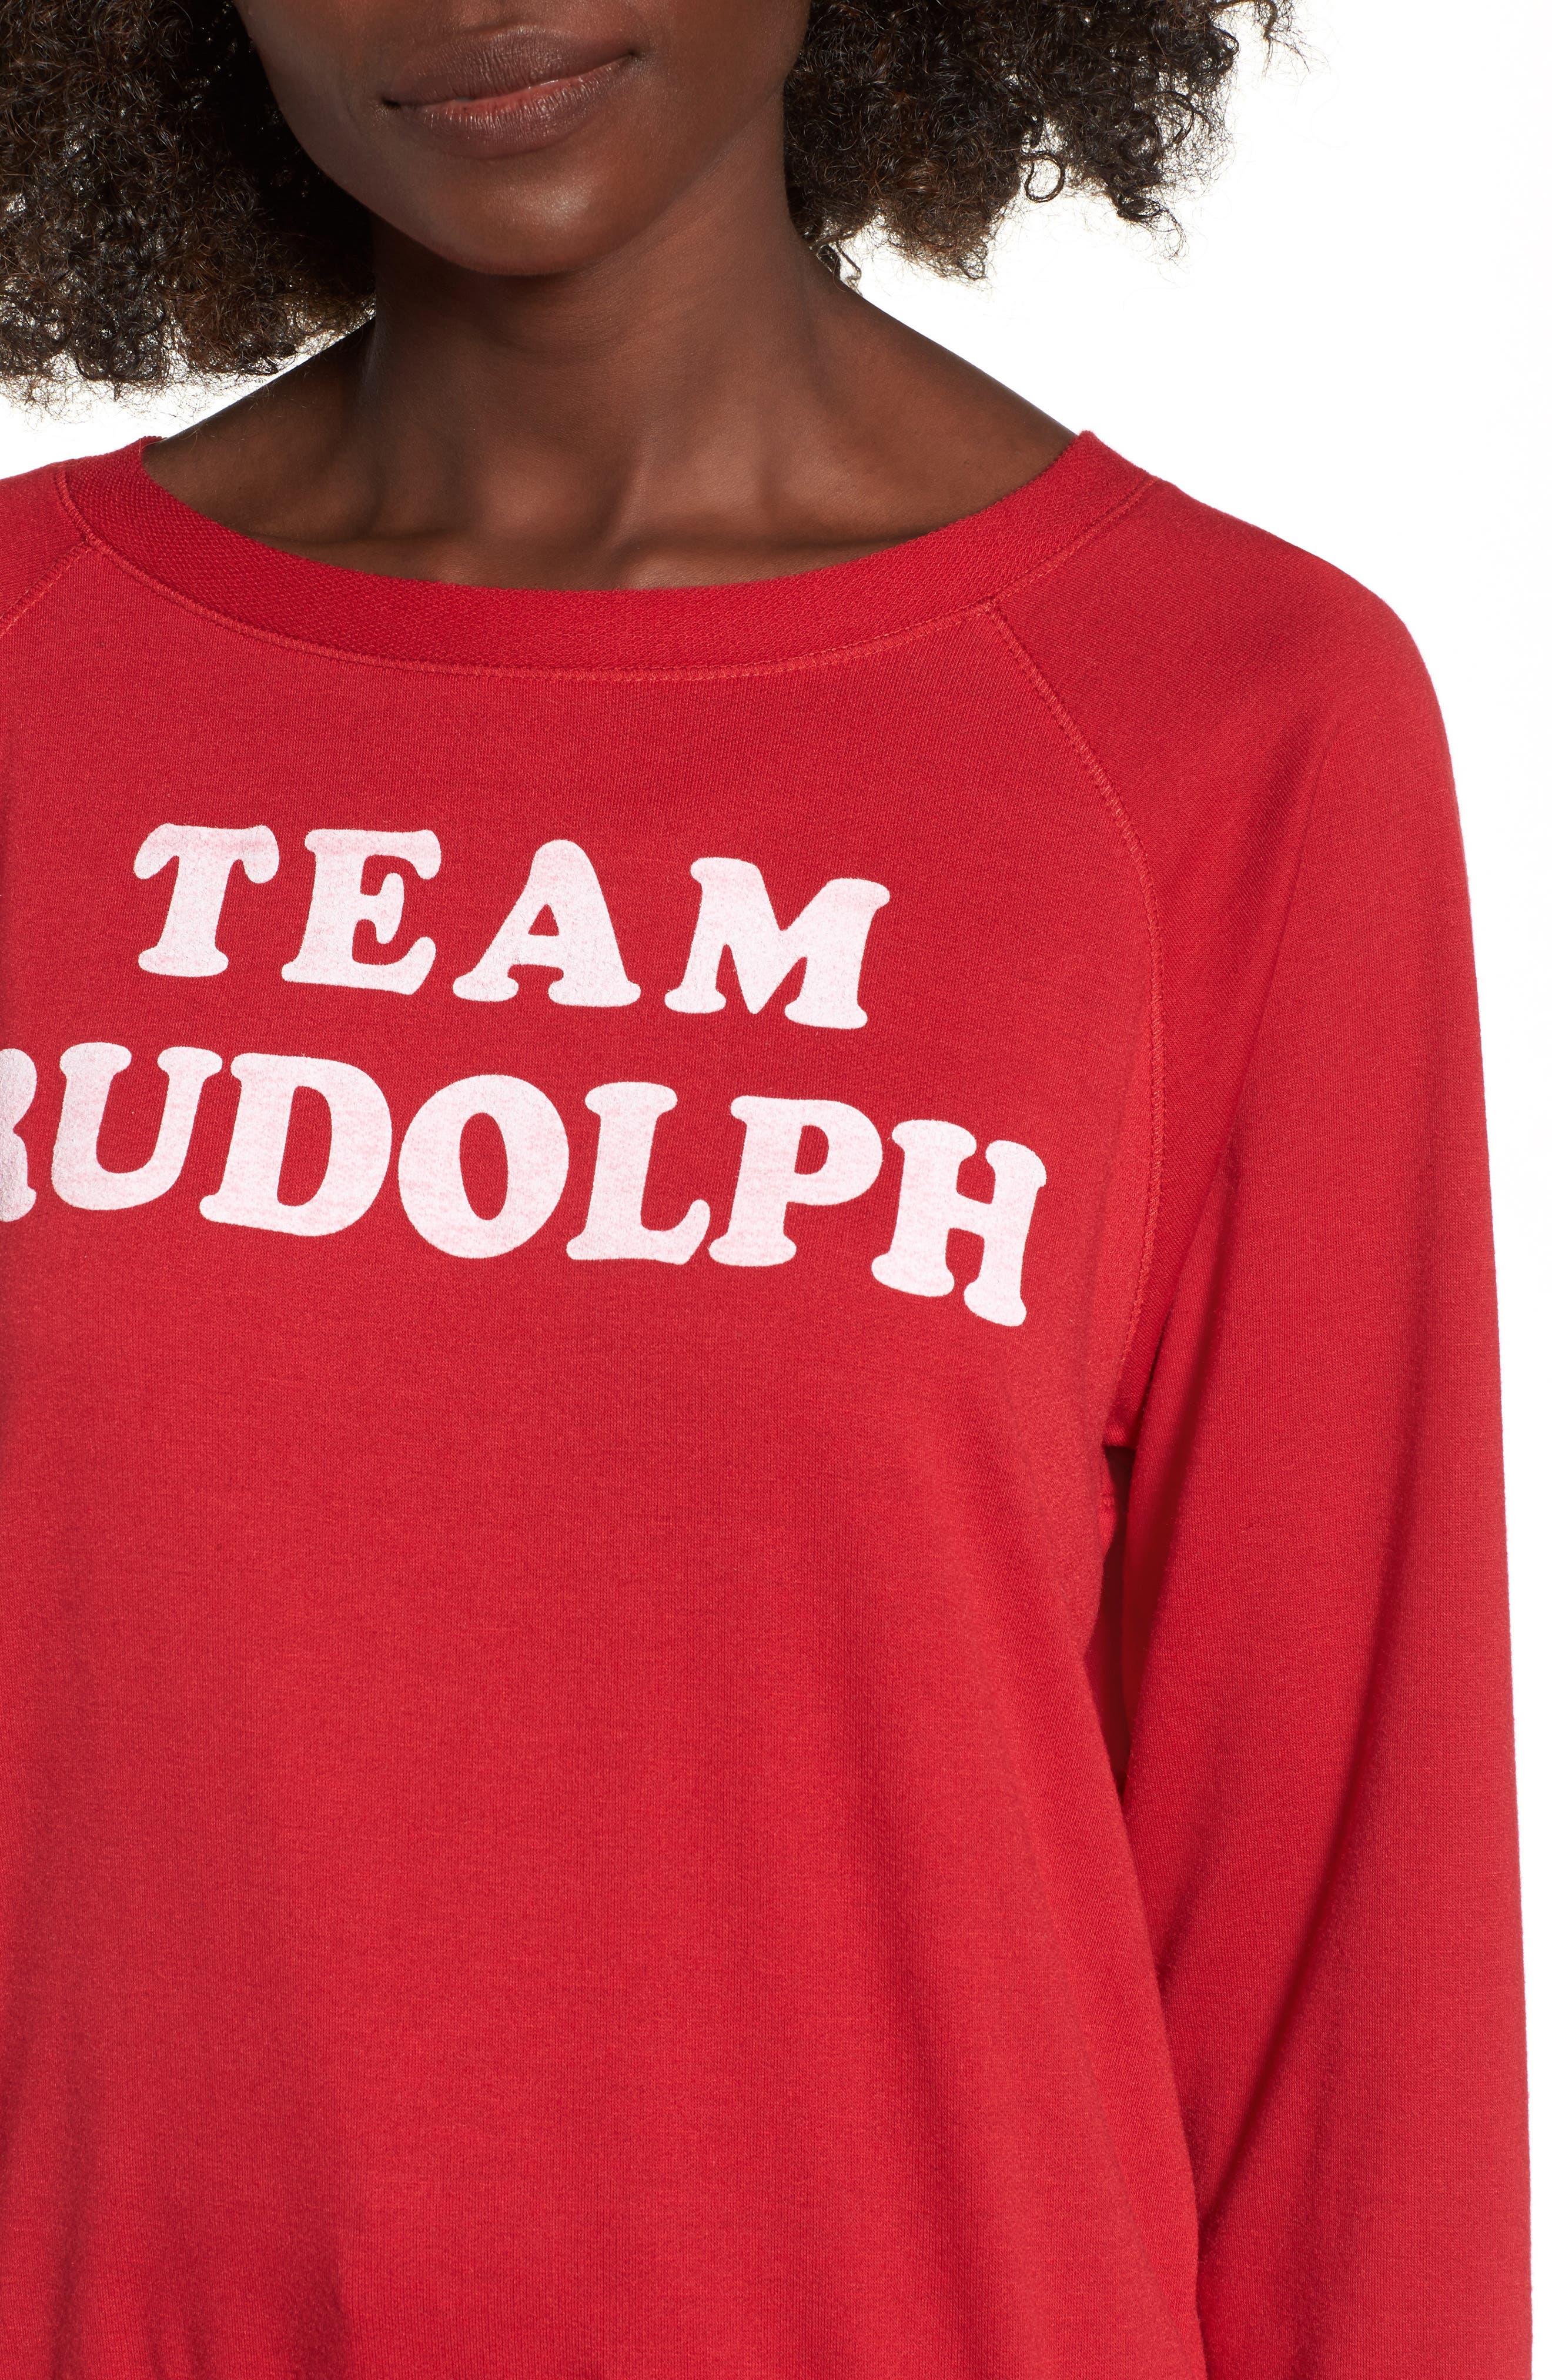 Team Rudolph Sweatshirt,                             Alternate thumbnail 4, color,                             Burgundy